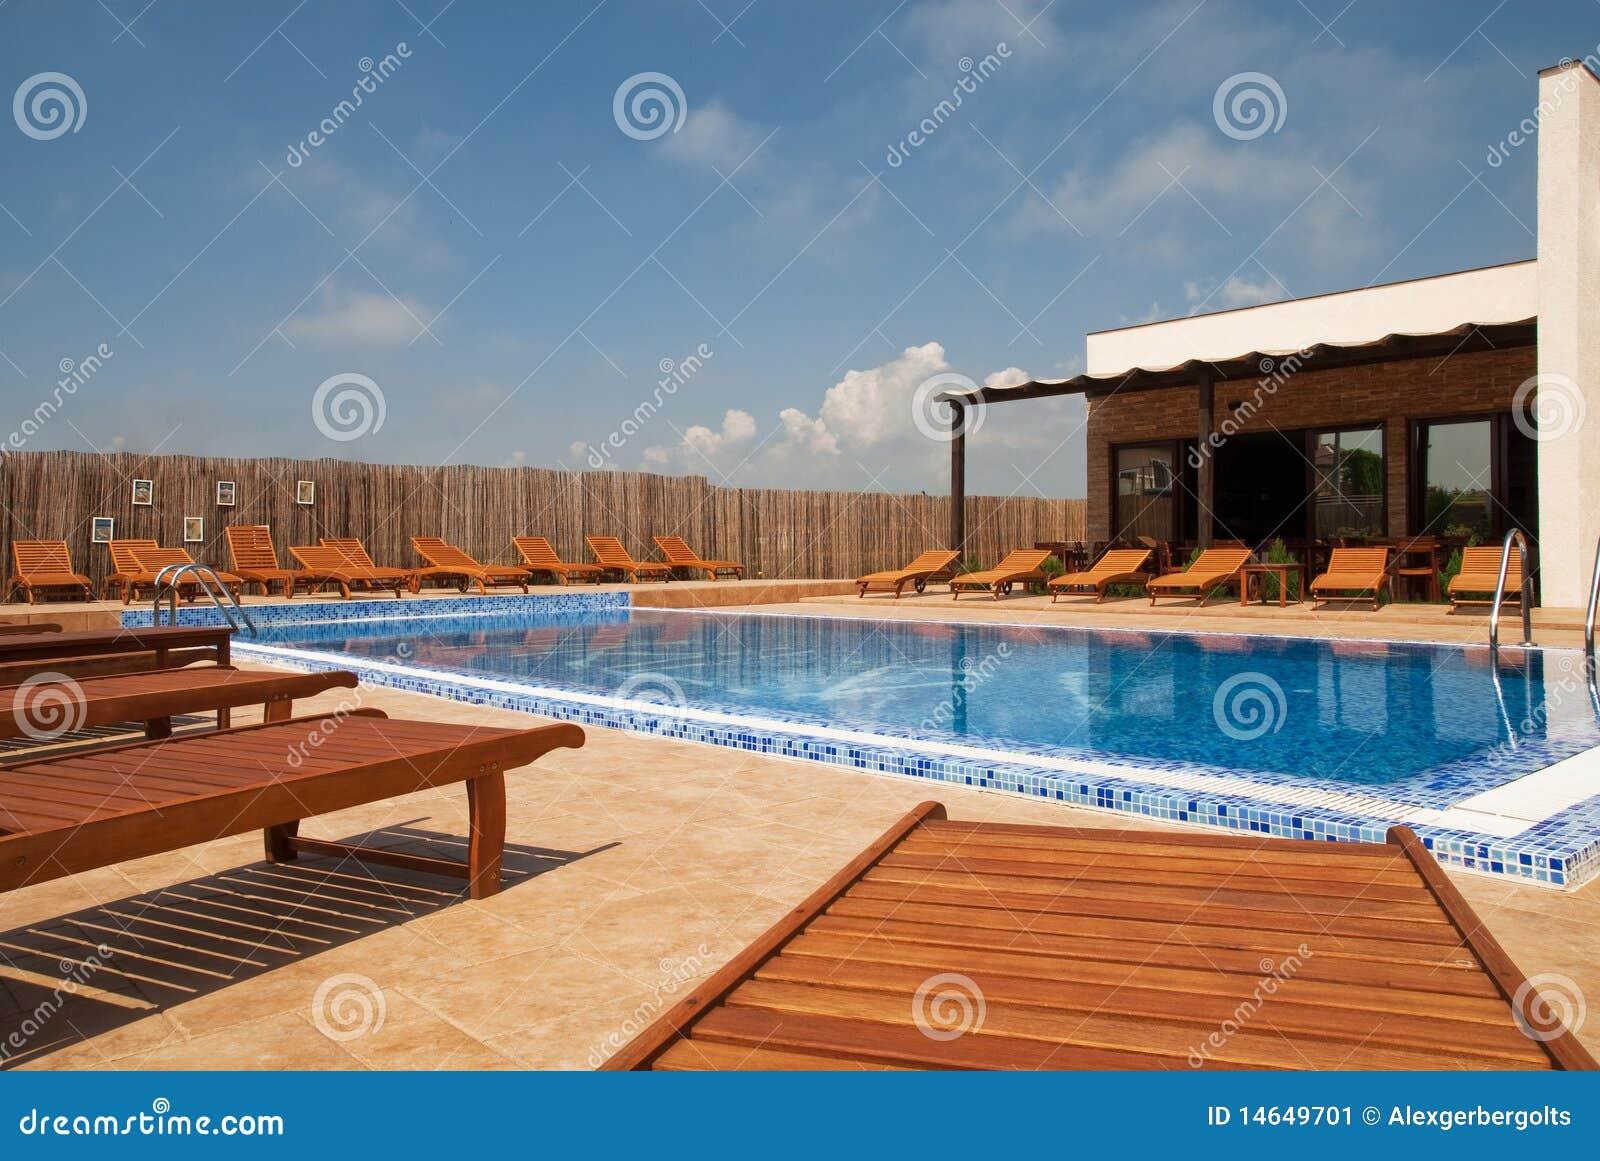 Casa moderna con la piscina concep de la forma de vida for Casas modernas con piscina